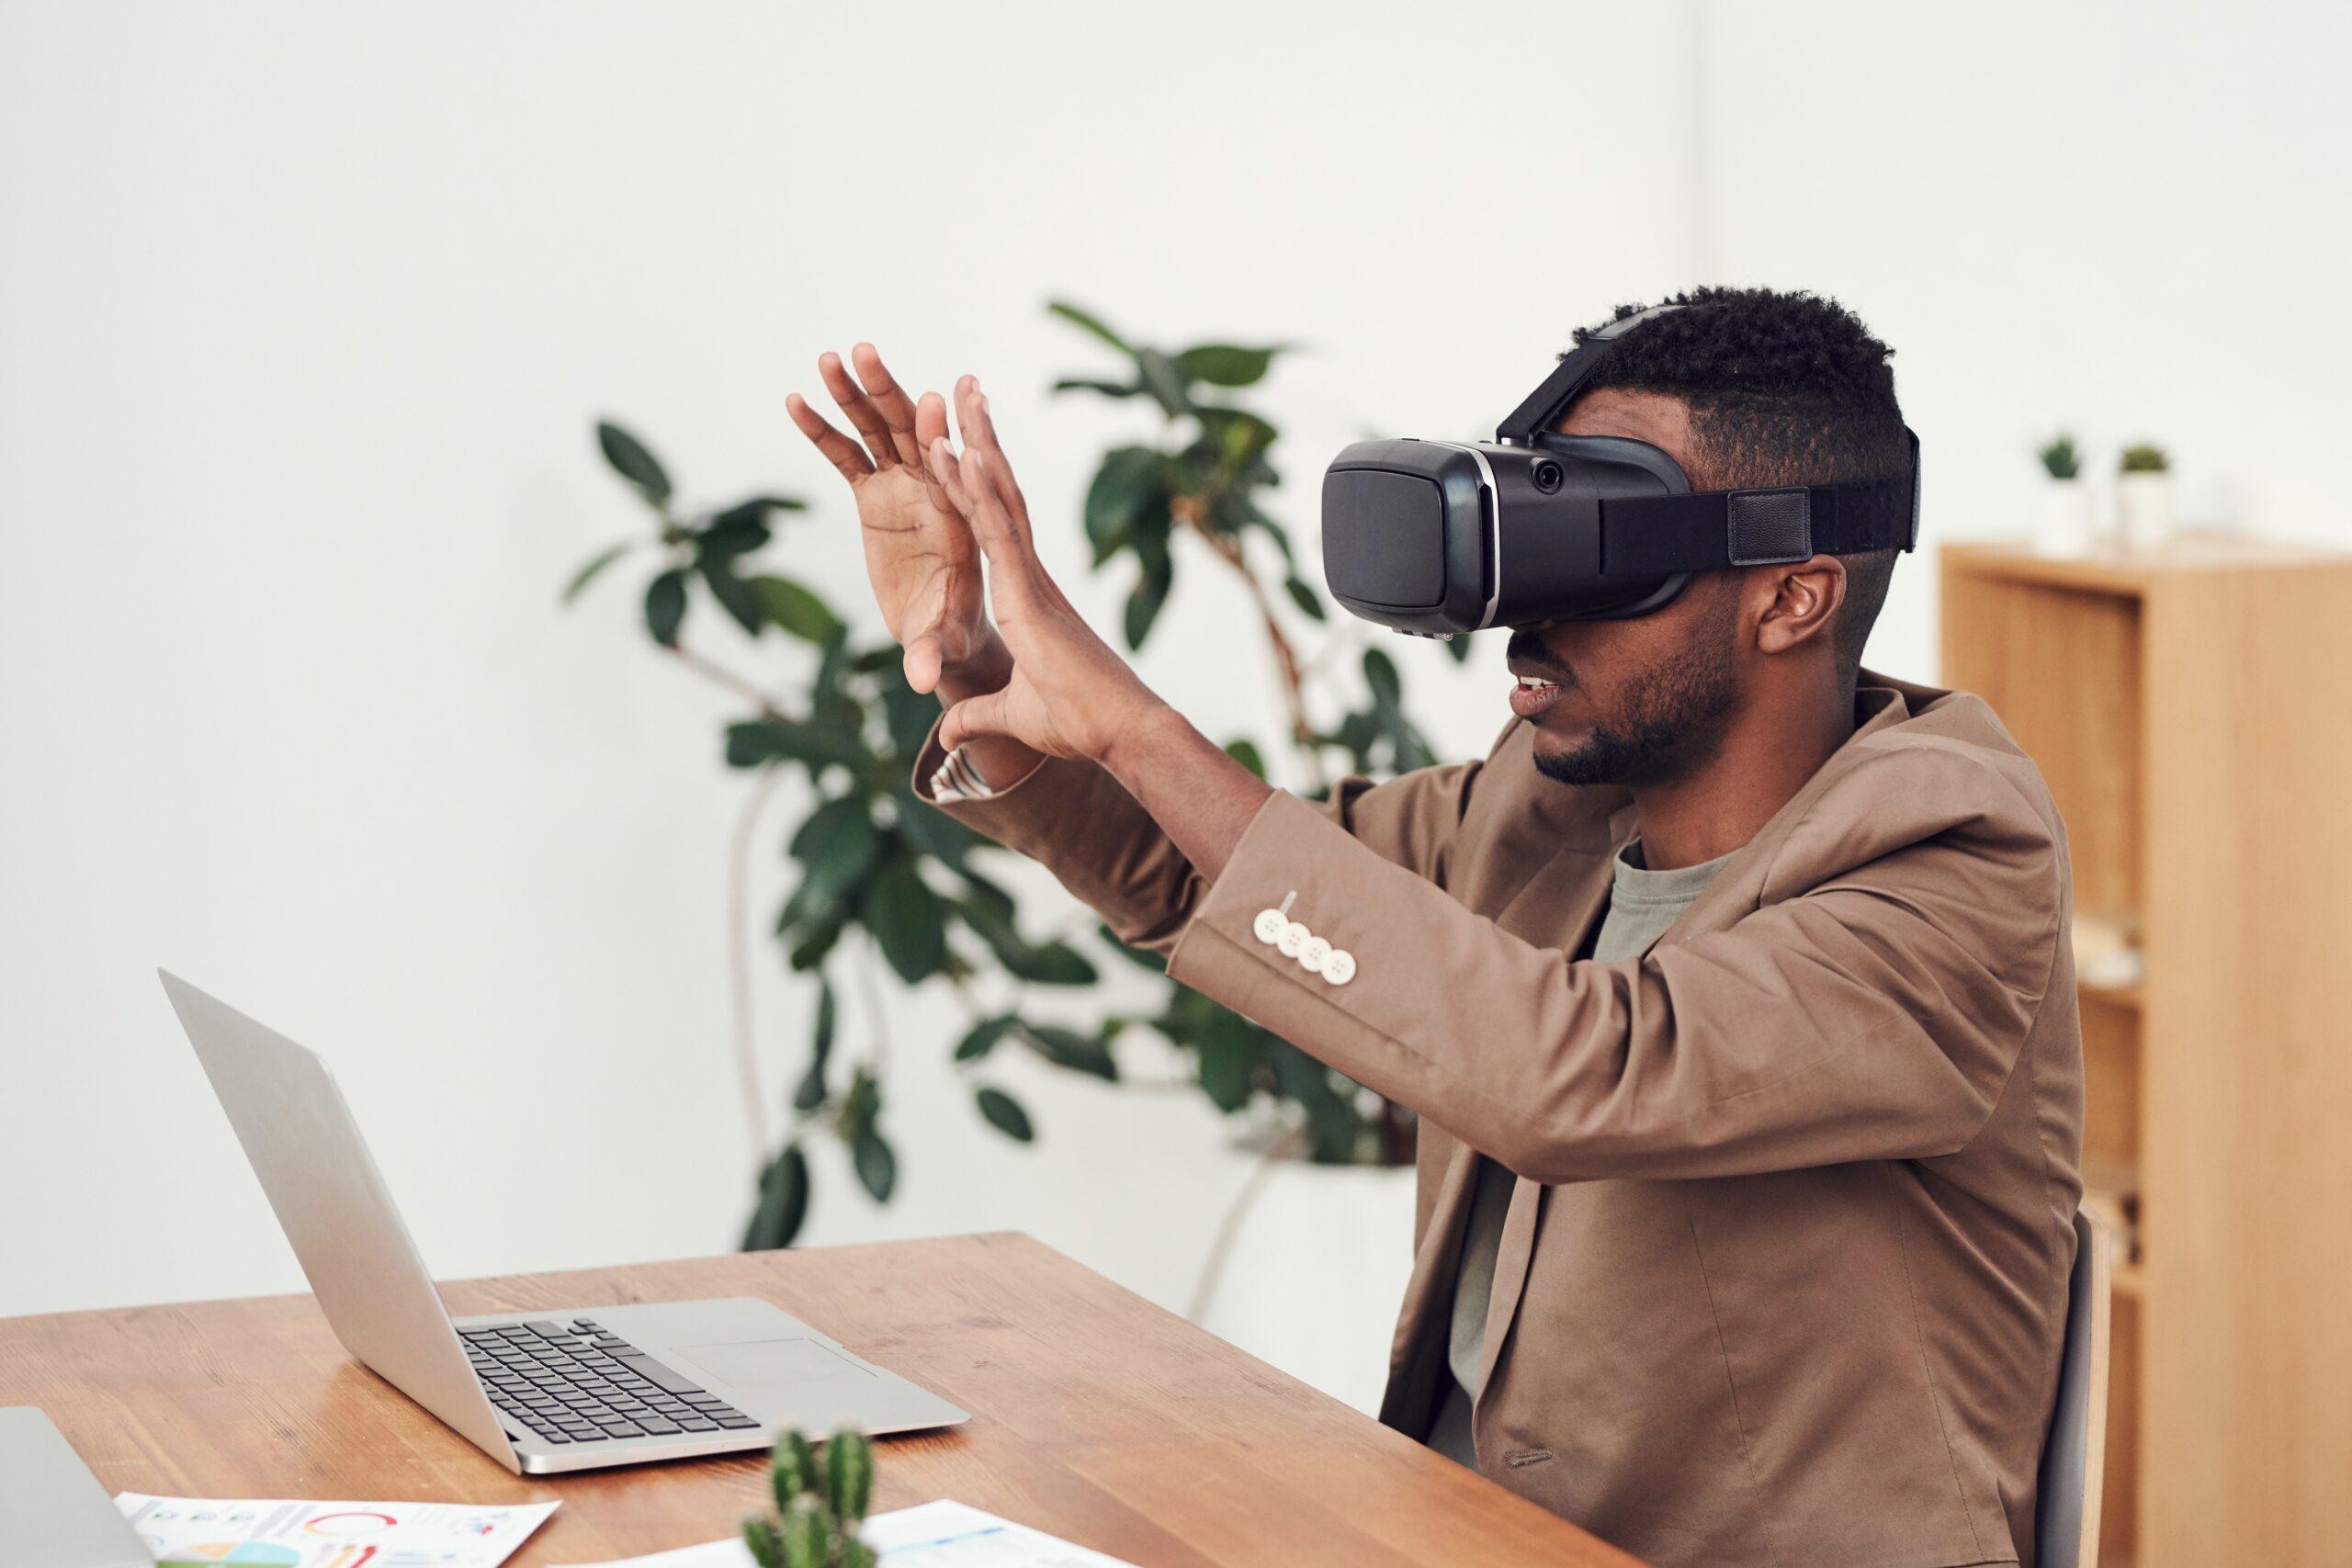 How Will VR Change, VR training, VR, Virtual Reality, VR training headset solutions, Virtual reality headset solution, VR headset, Virtual reality headset,